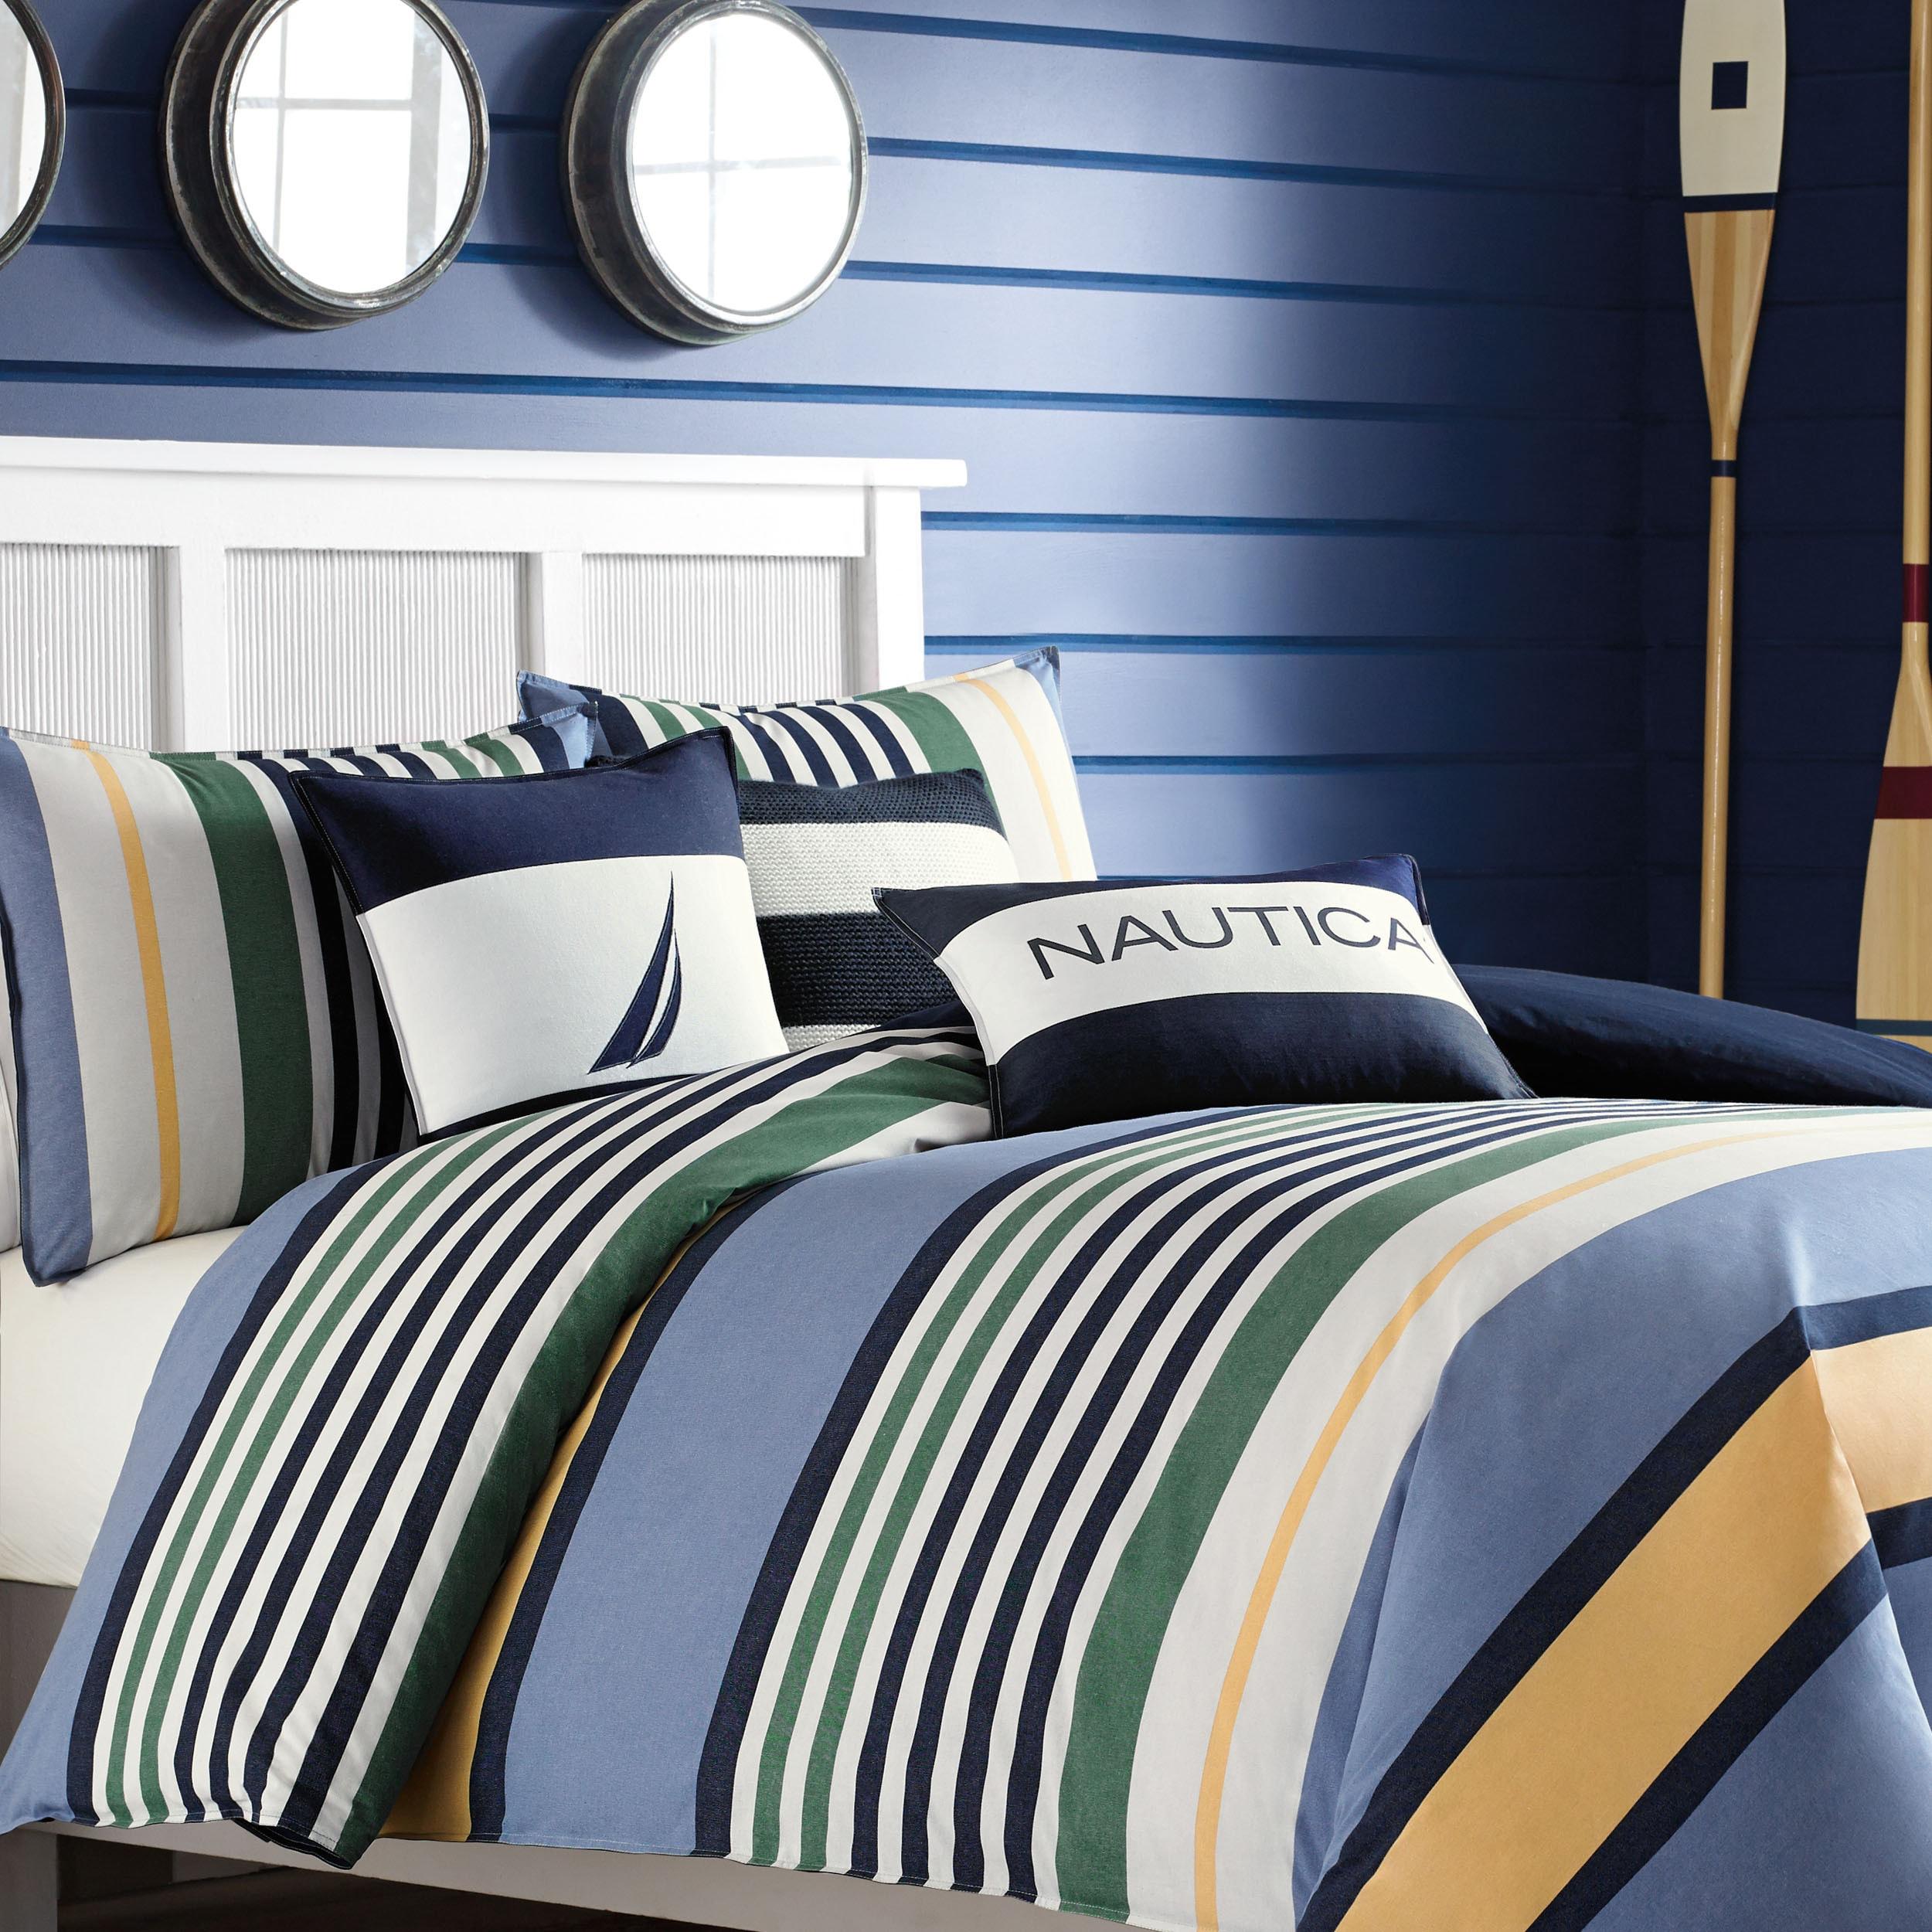 caswell rack sets nautica comforter nordstrom of set product shop tel sham king image